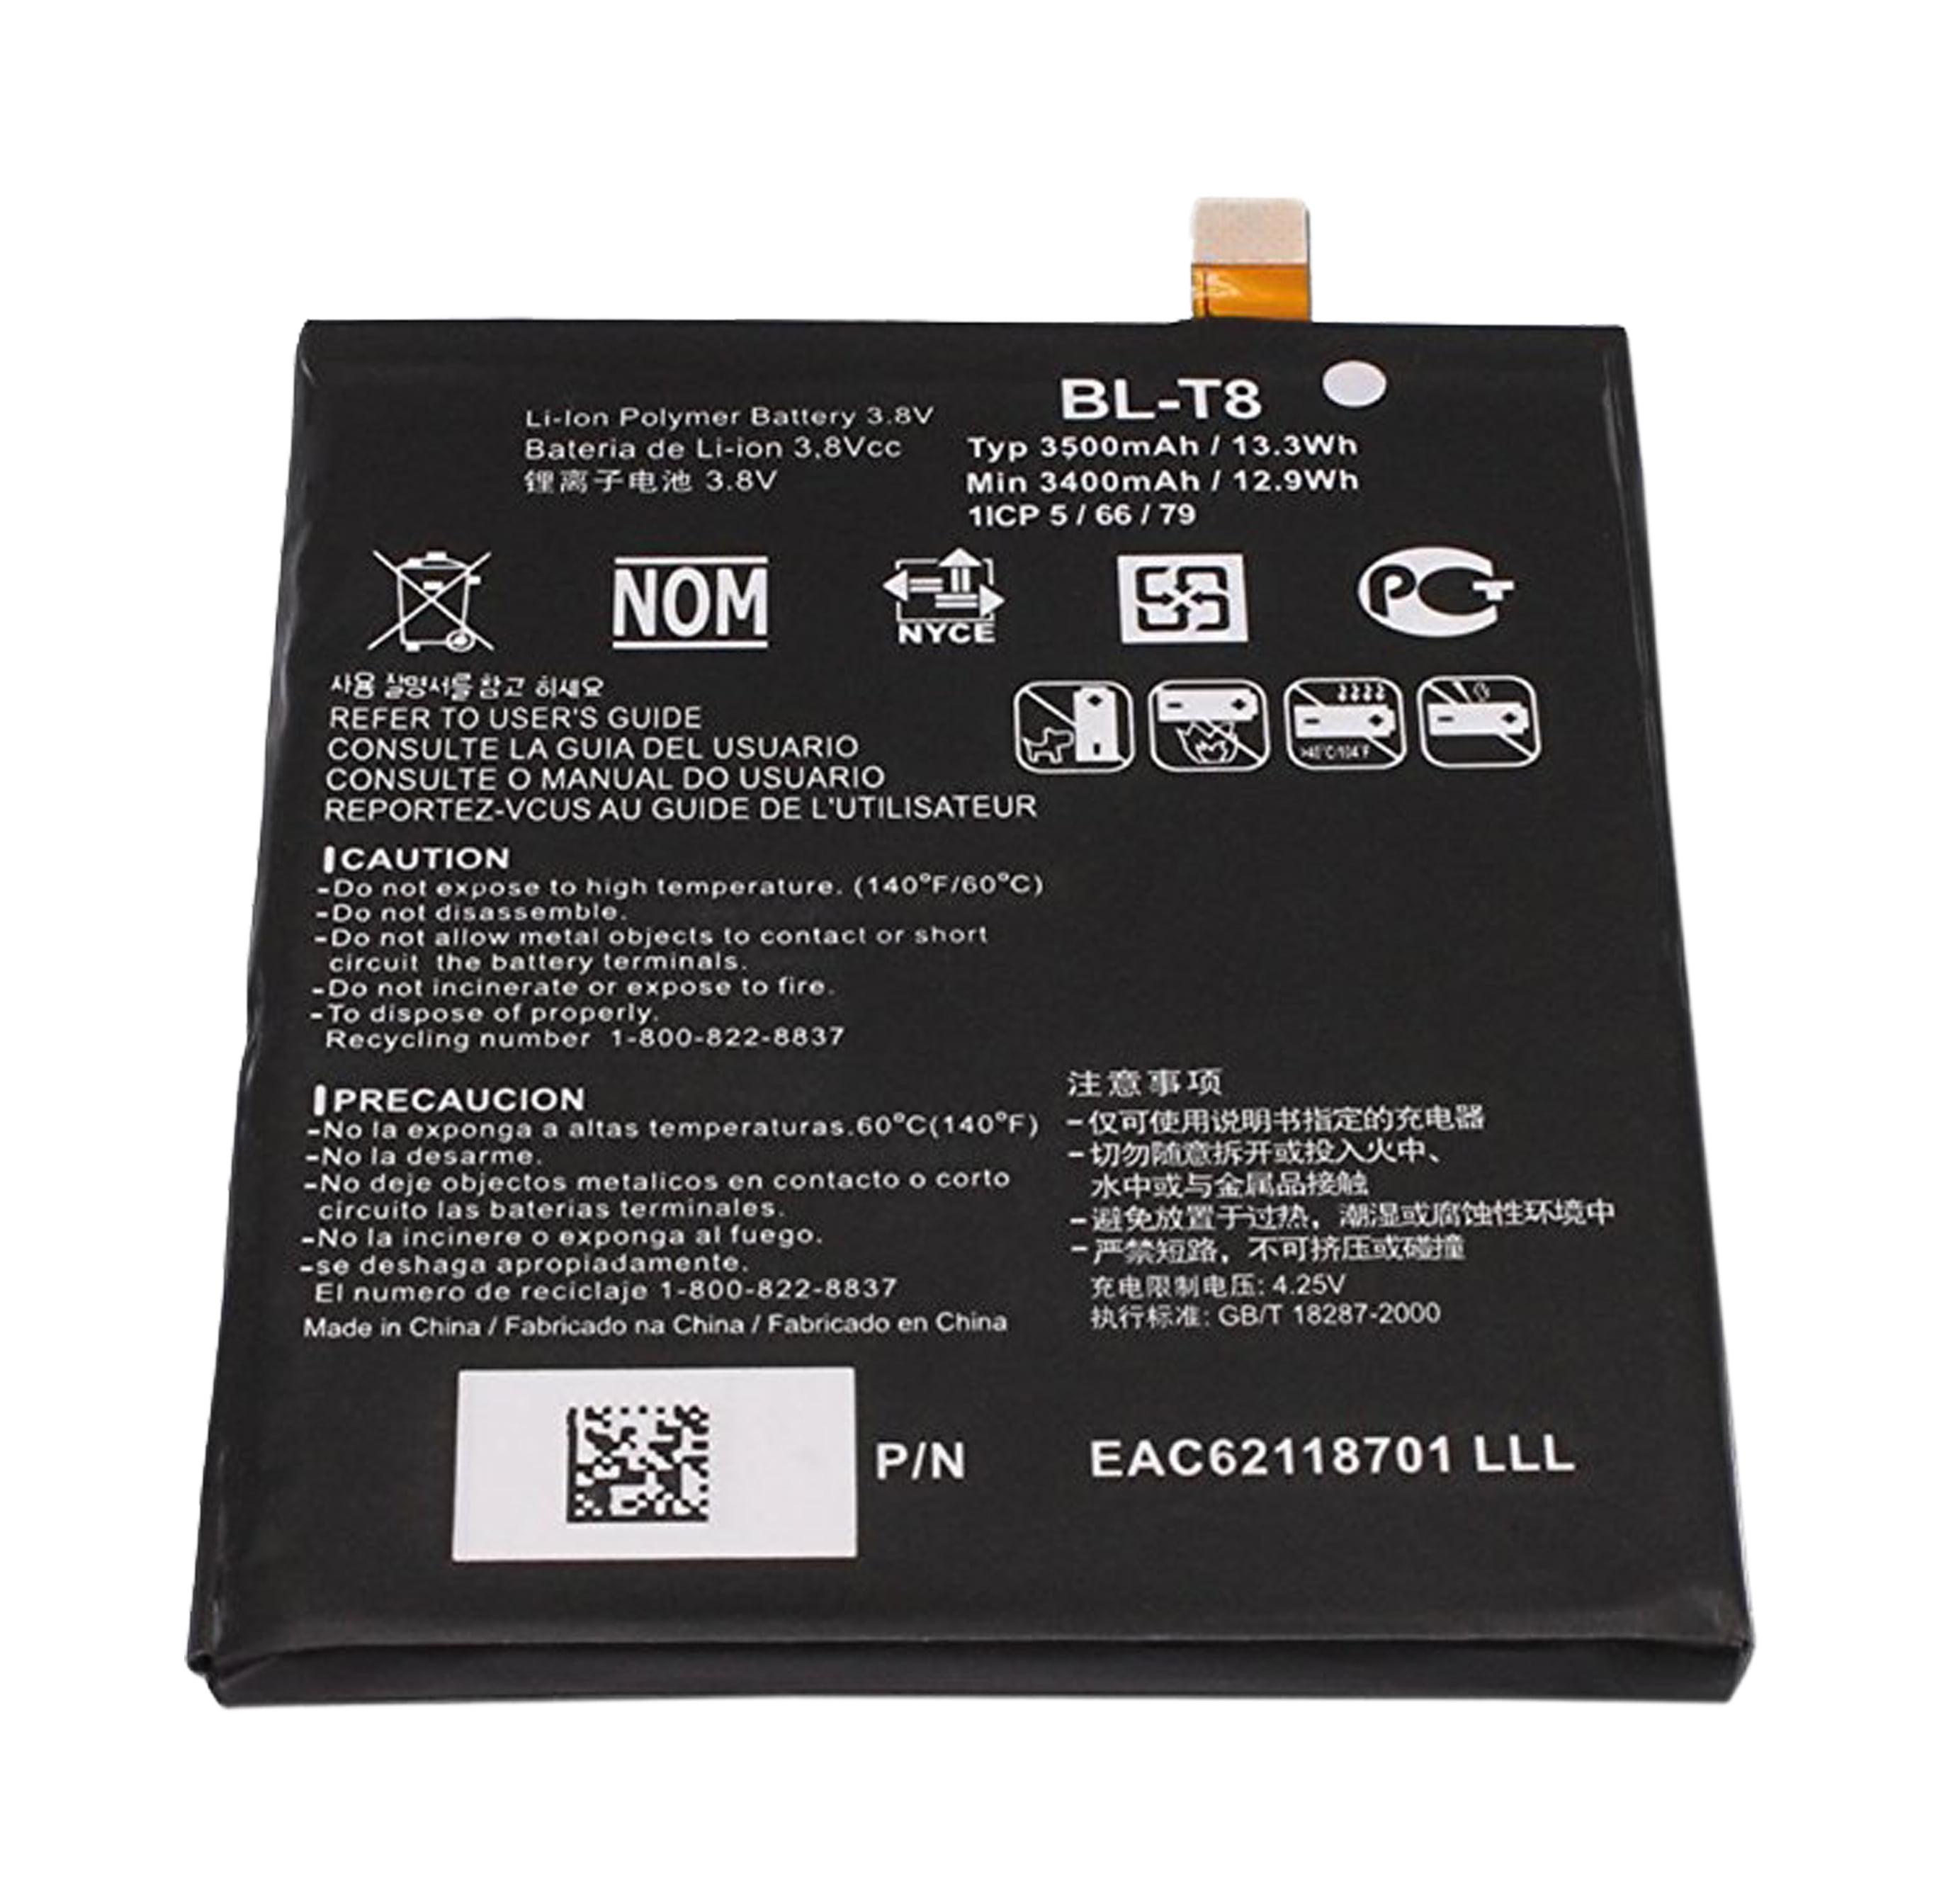 World Star ™ Replacement Battery BL-T8 3500mAh 3.8V for LG G Flex D950 D955 D958 D959 F340 LS995 ( 2 Years Warranty )